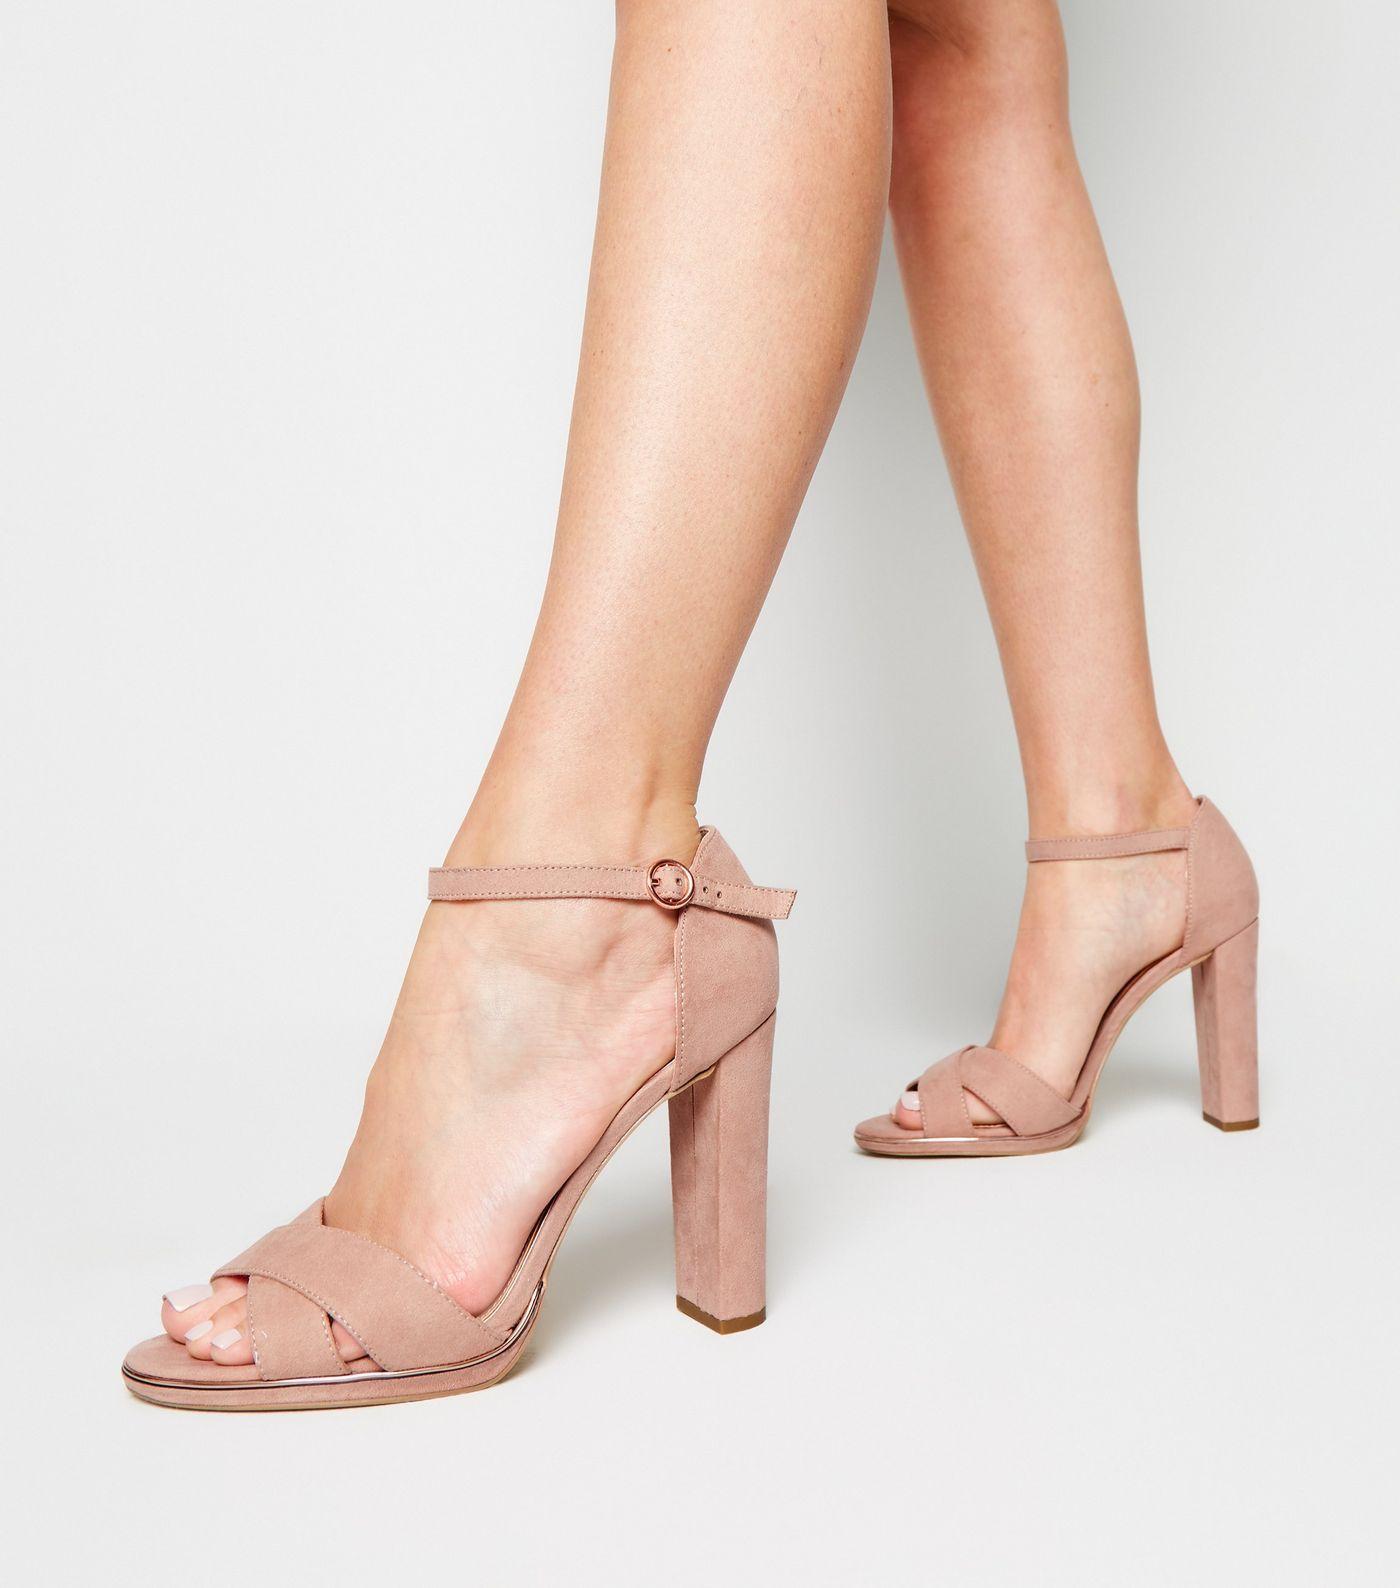 af0a3544d6 Wide Fit Nude Suedette Metal Trim Sandals in 2019   Footware ...